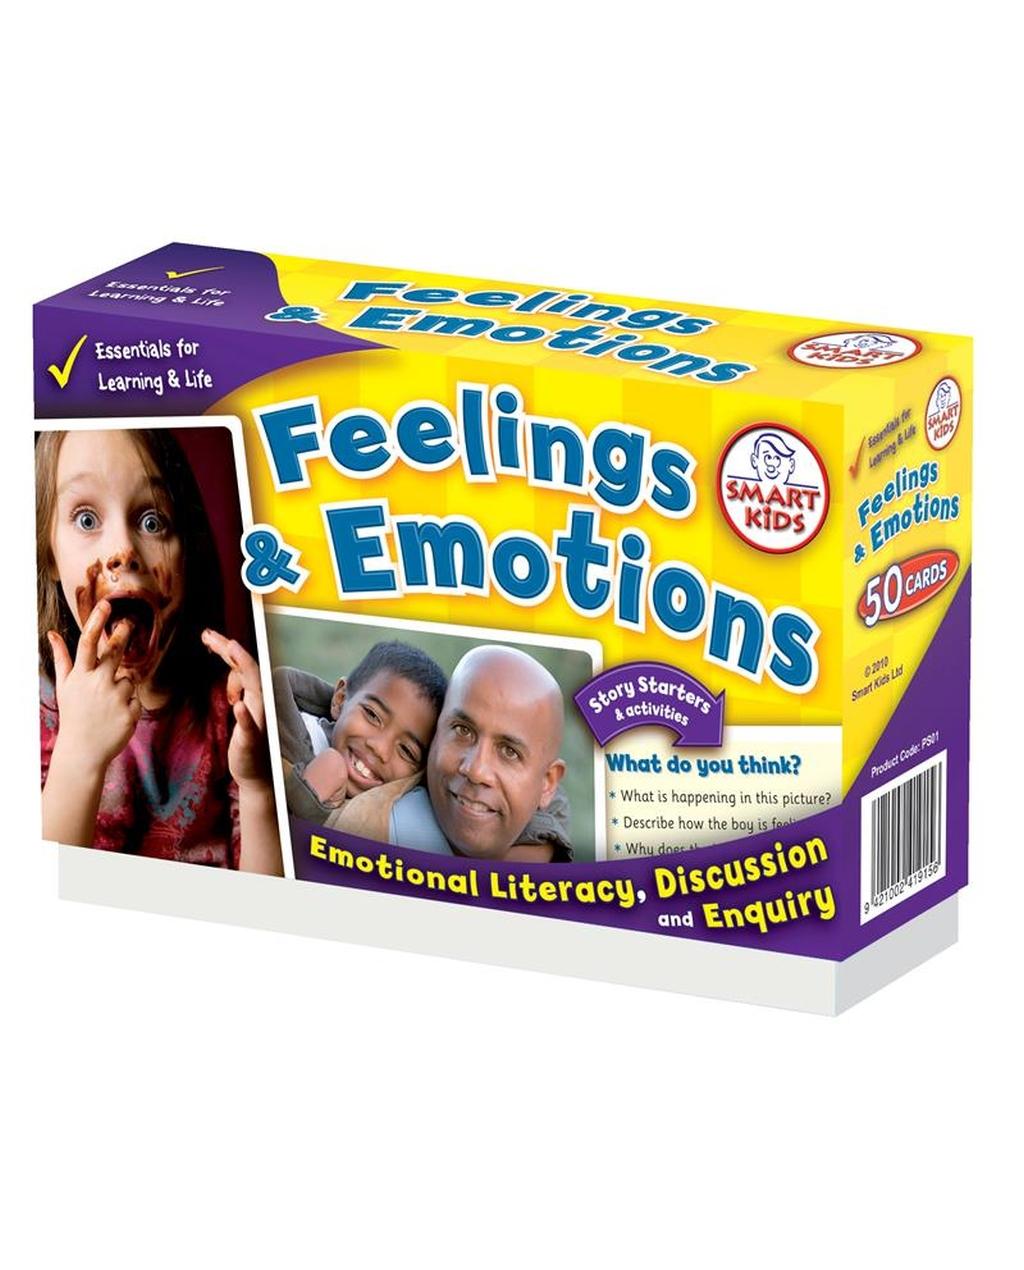 Feelings & Emotion Cards